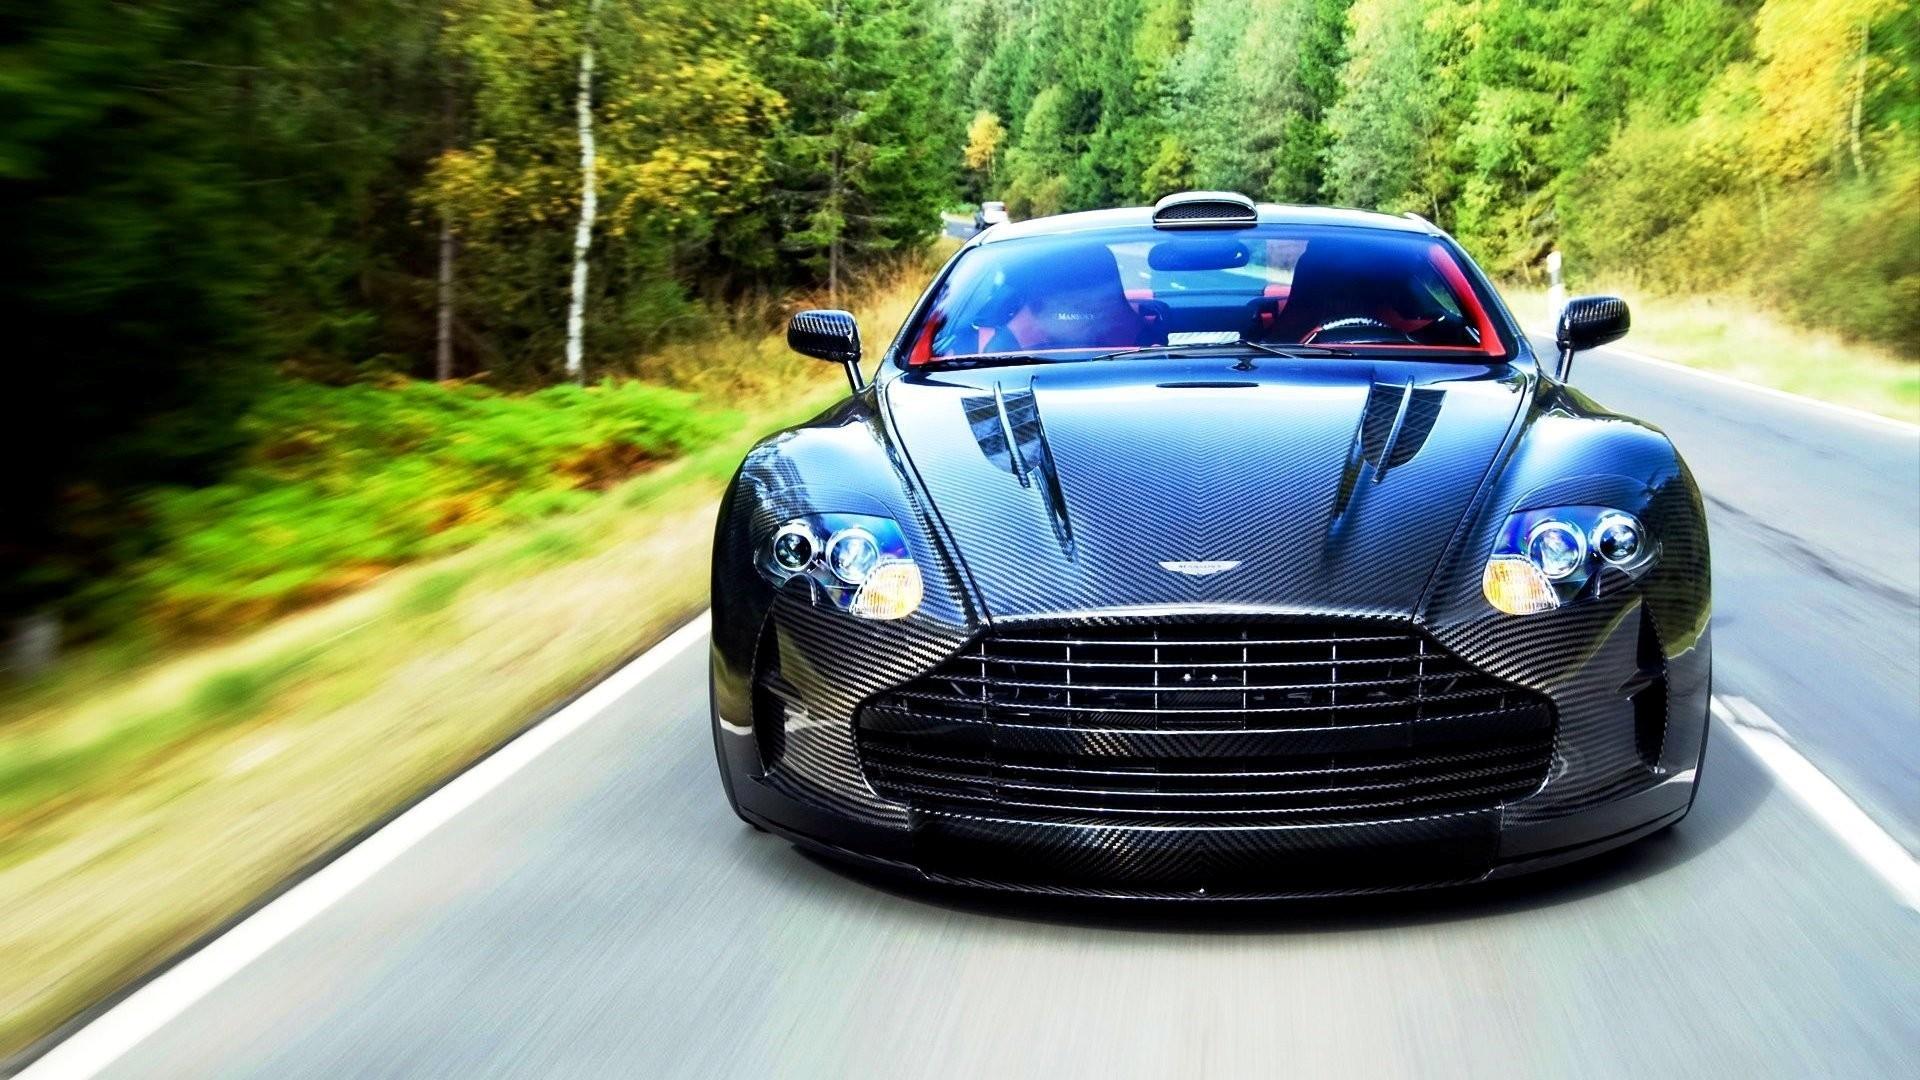 Wallpaper Aston Martin Vanquish 2015 Front View Movement